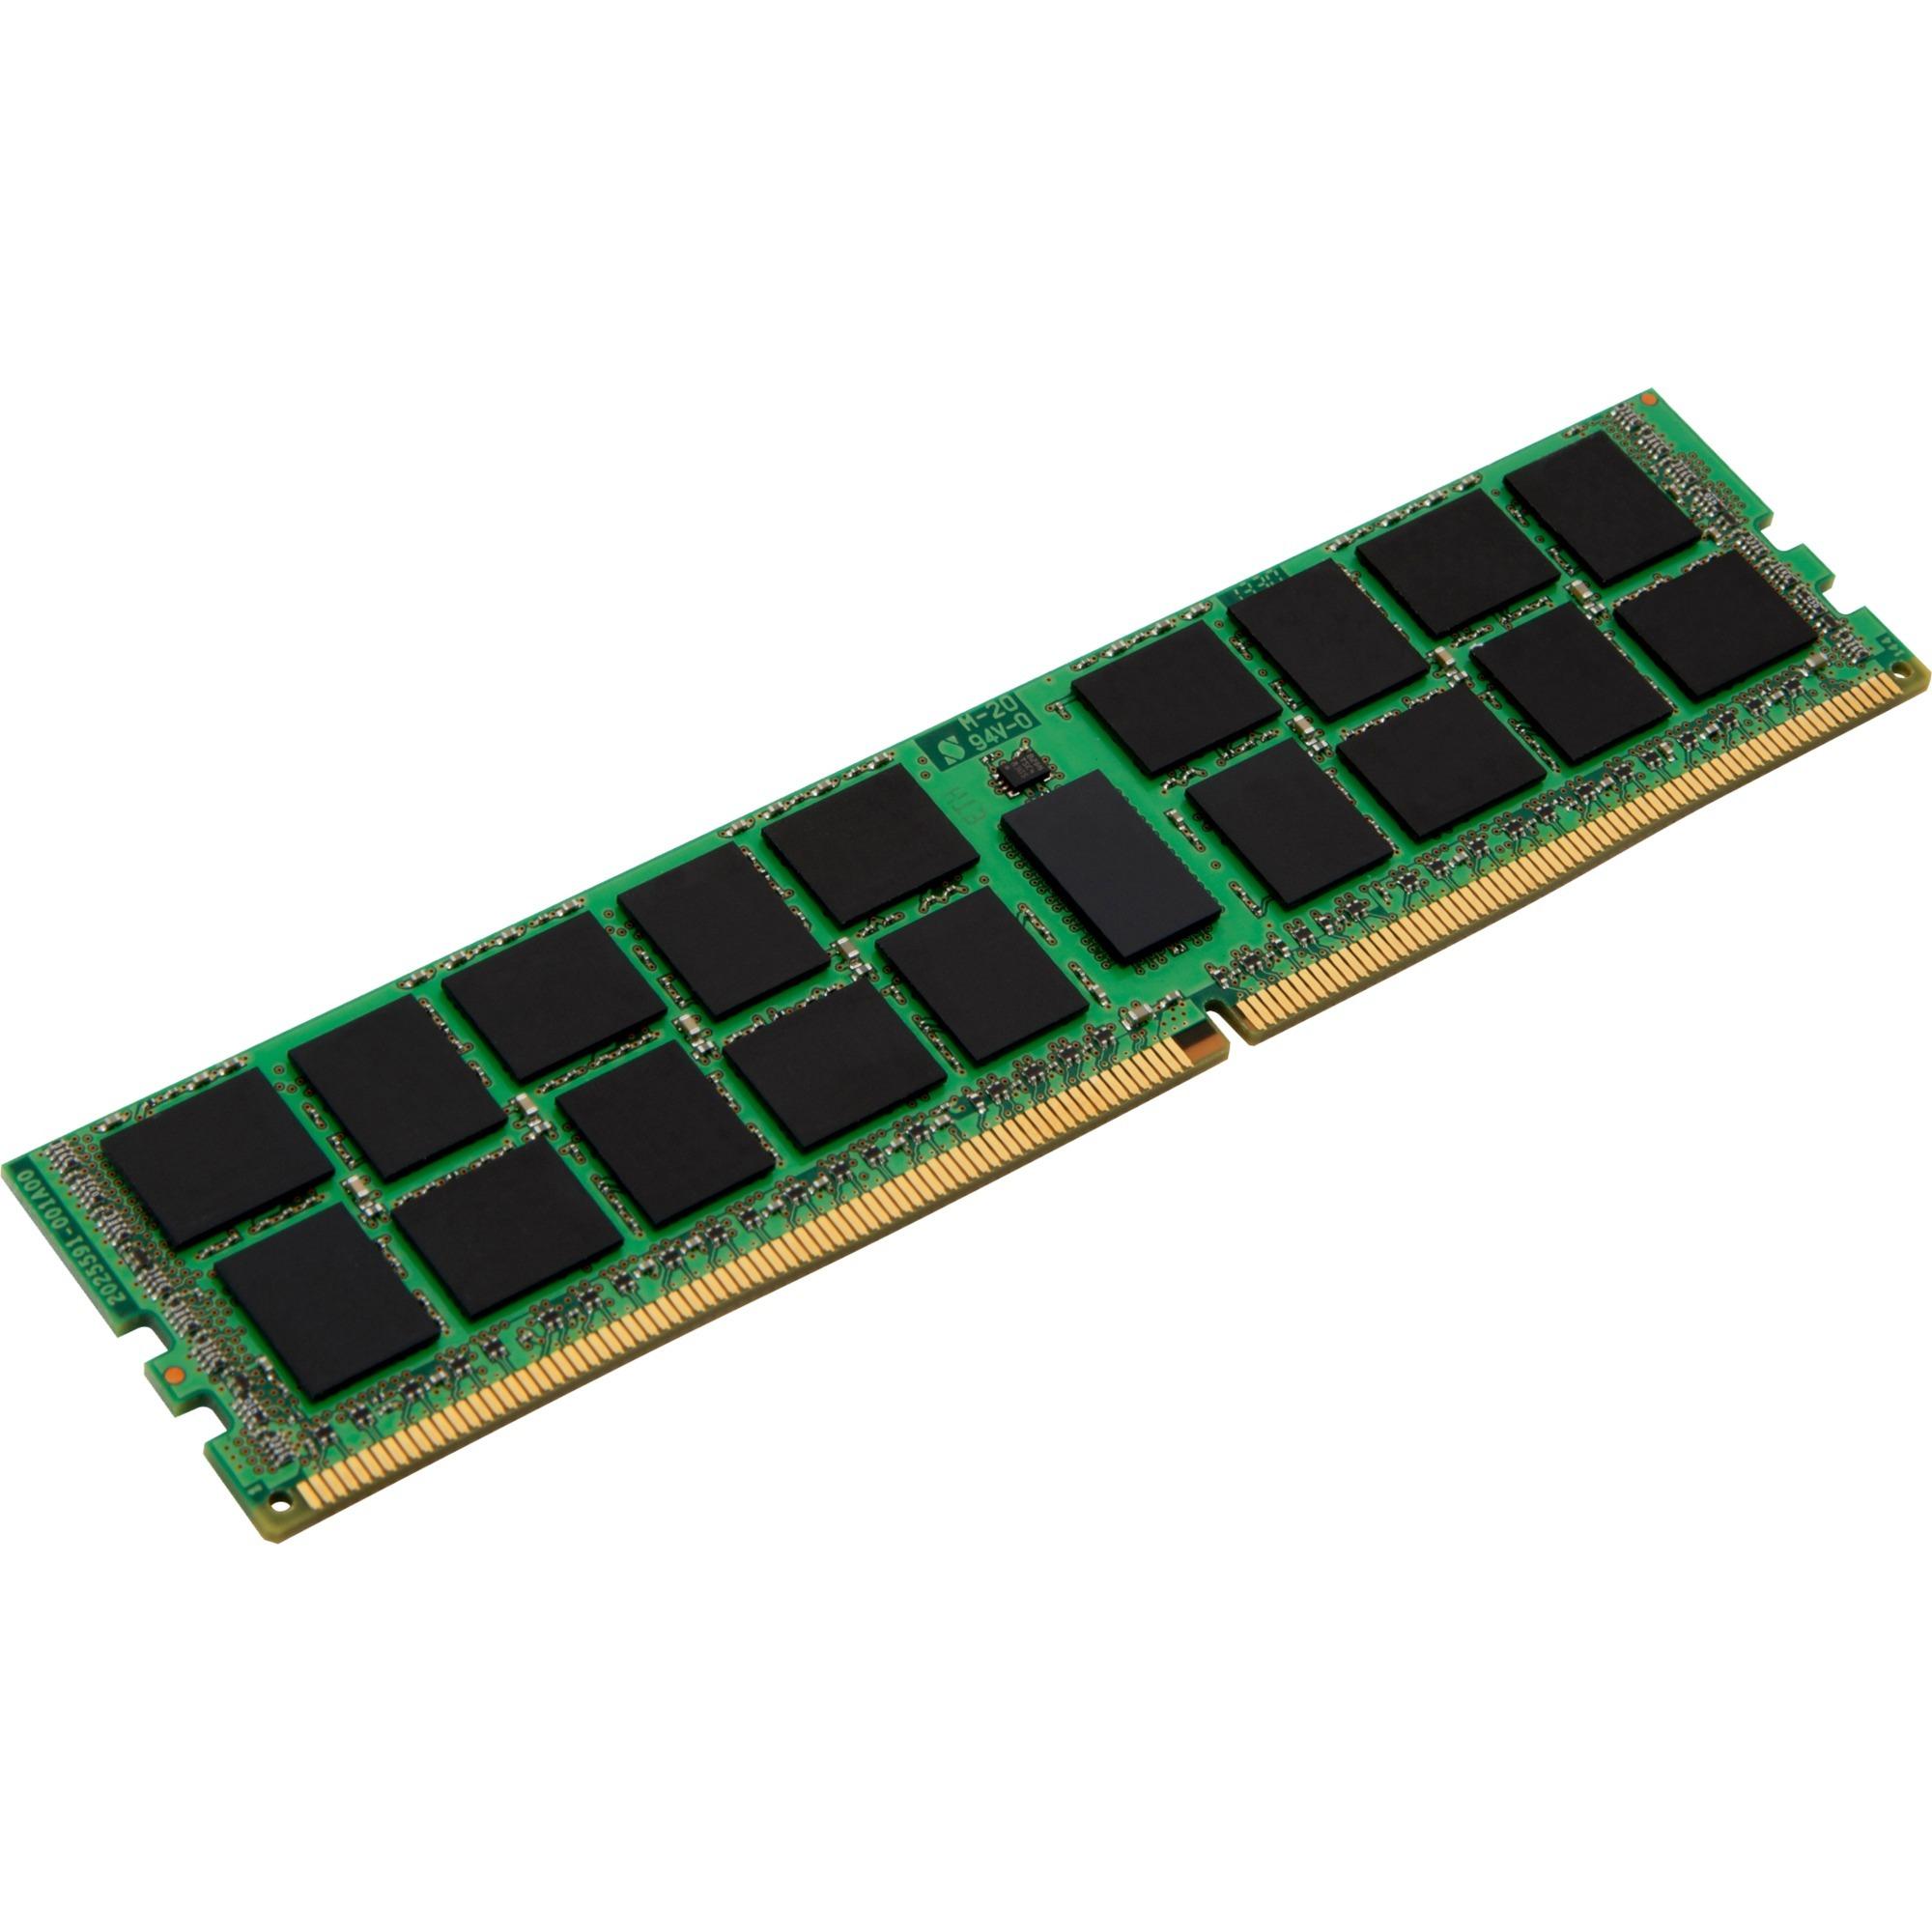 System Specific Memory 32GB DDR4 2400MHz 32GB DDR4 2400MHz ECC módulo de memoria, Memoria RAM